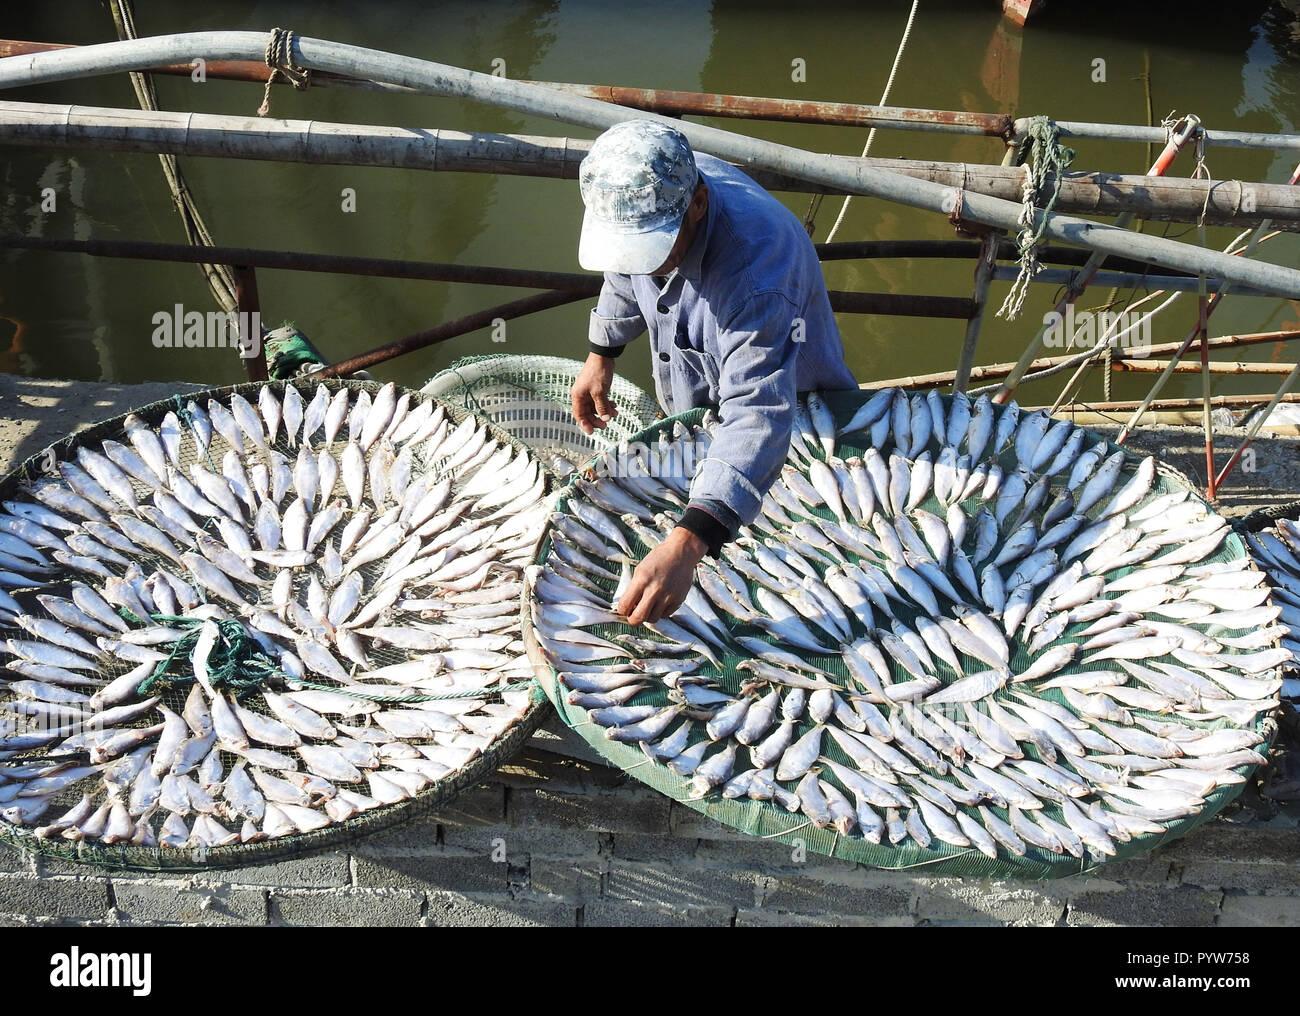 Lianyungang, China's Jiangsu Province. 30th Oct, 2018. A fisherman airs fish in Lianyun District of Lianyungang City, east China's Jiangsu Province, Oct. 30, 2018. Credit: Geng Yuhe/Xinhua/Alamy Live News - Stock Image